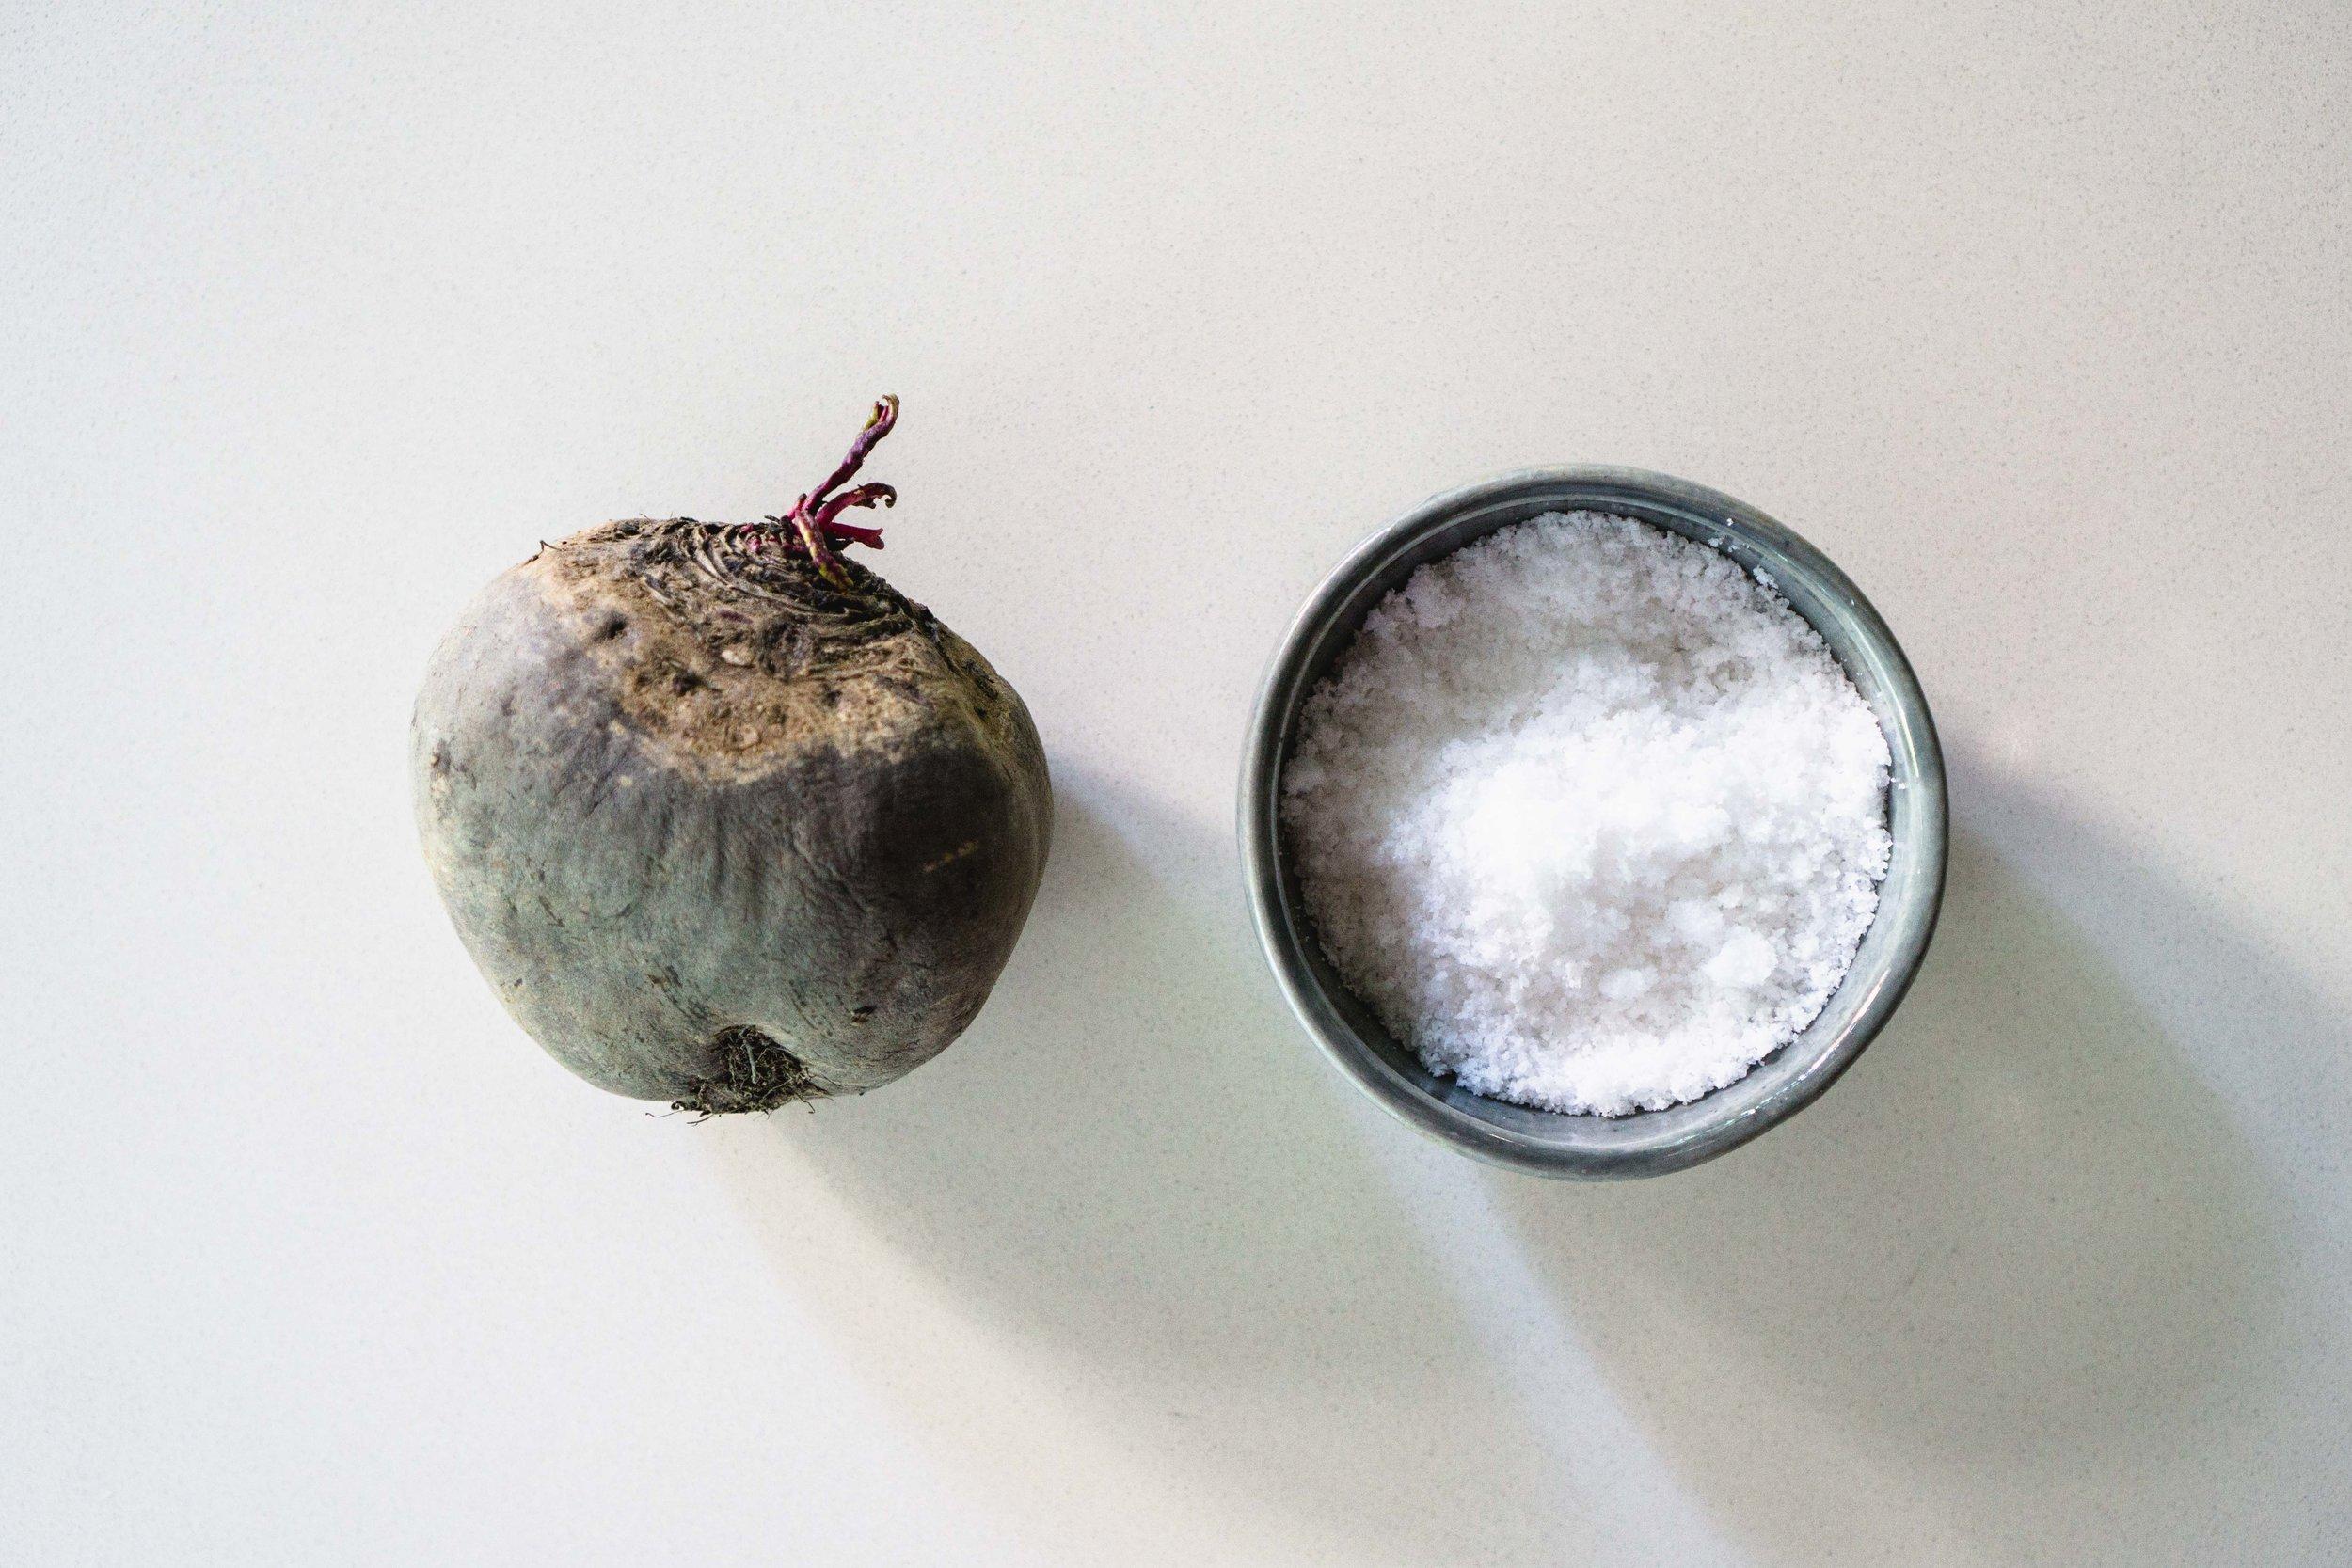 Beetroot + Salt = ?